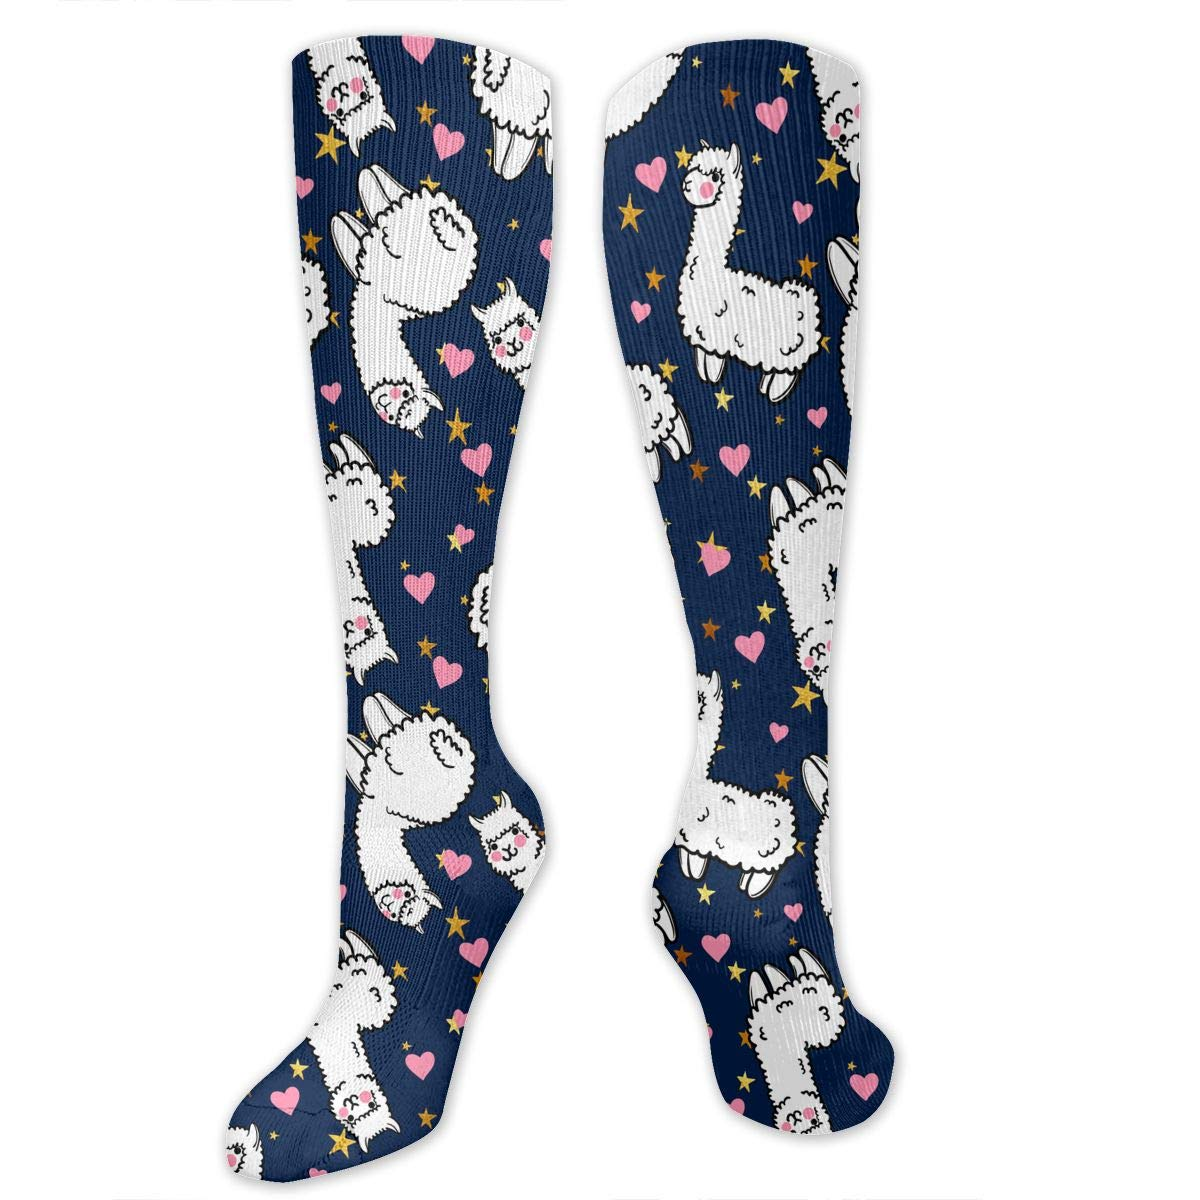 High Calf 78/% Alpaca Boot Socks